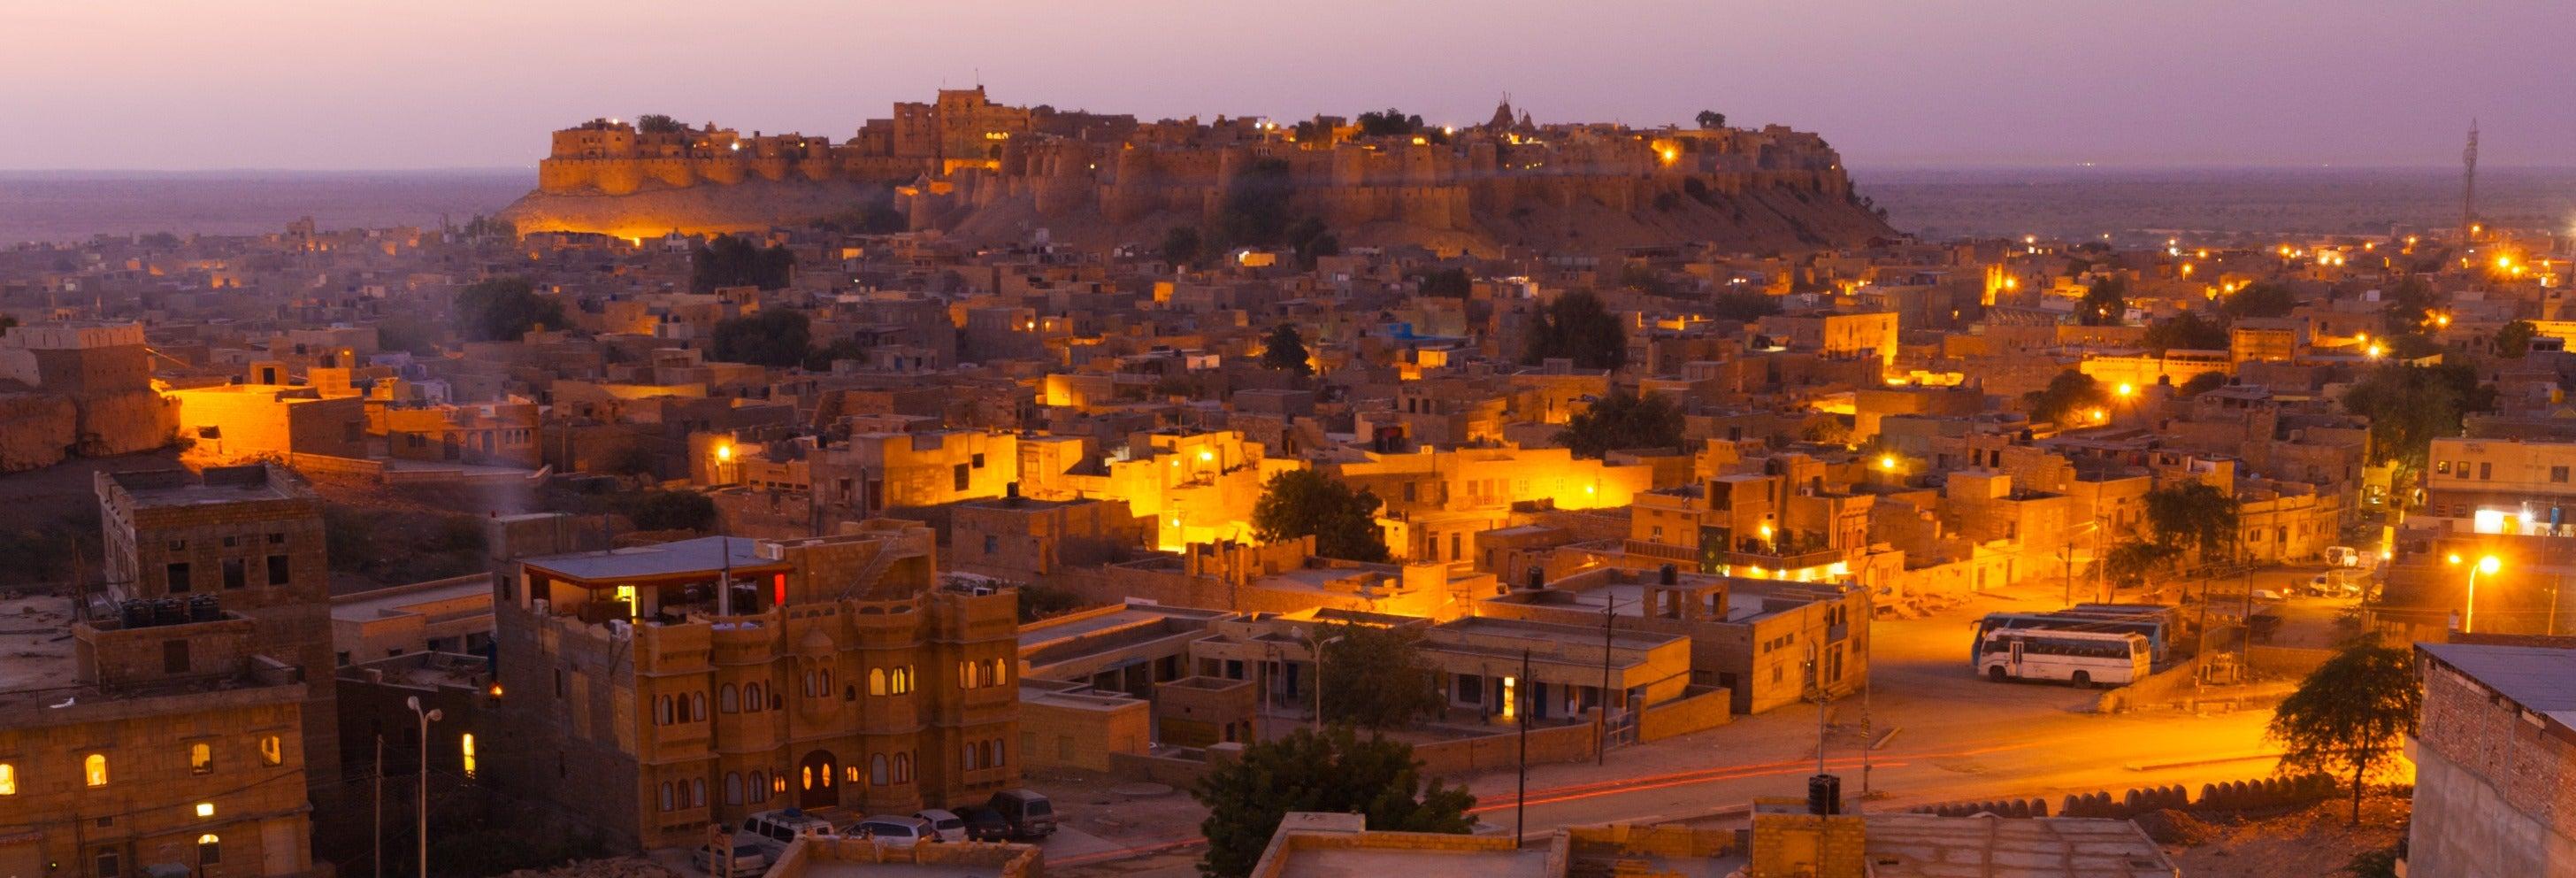 Tour nocturno por Jaisalmer